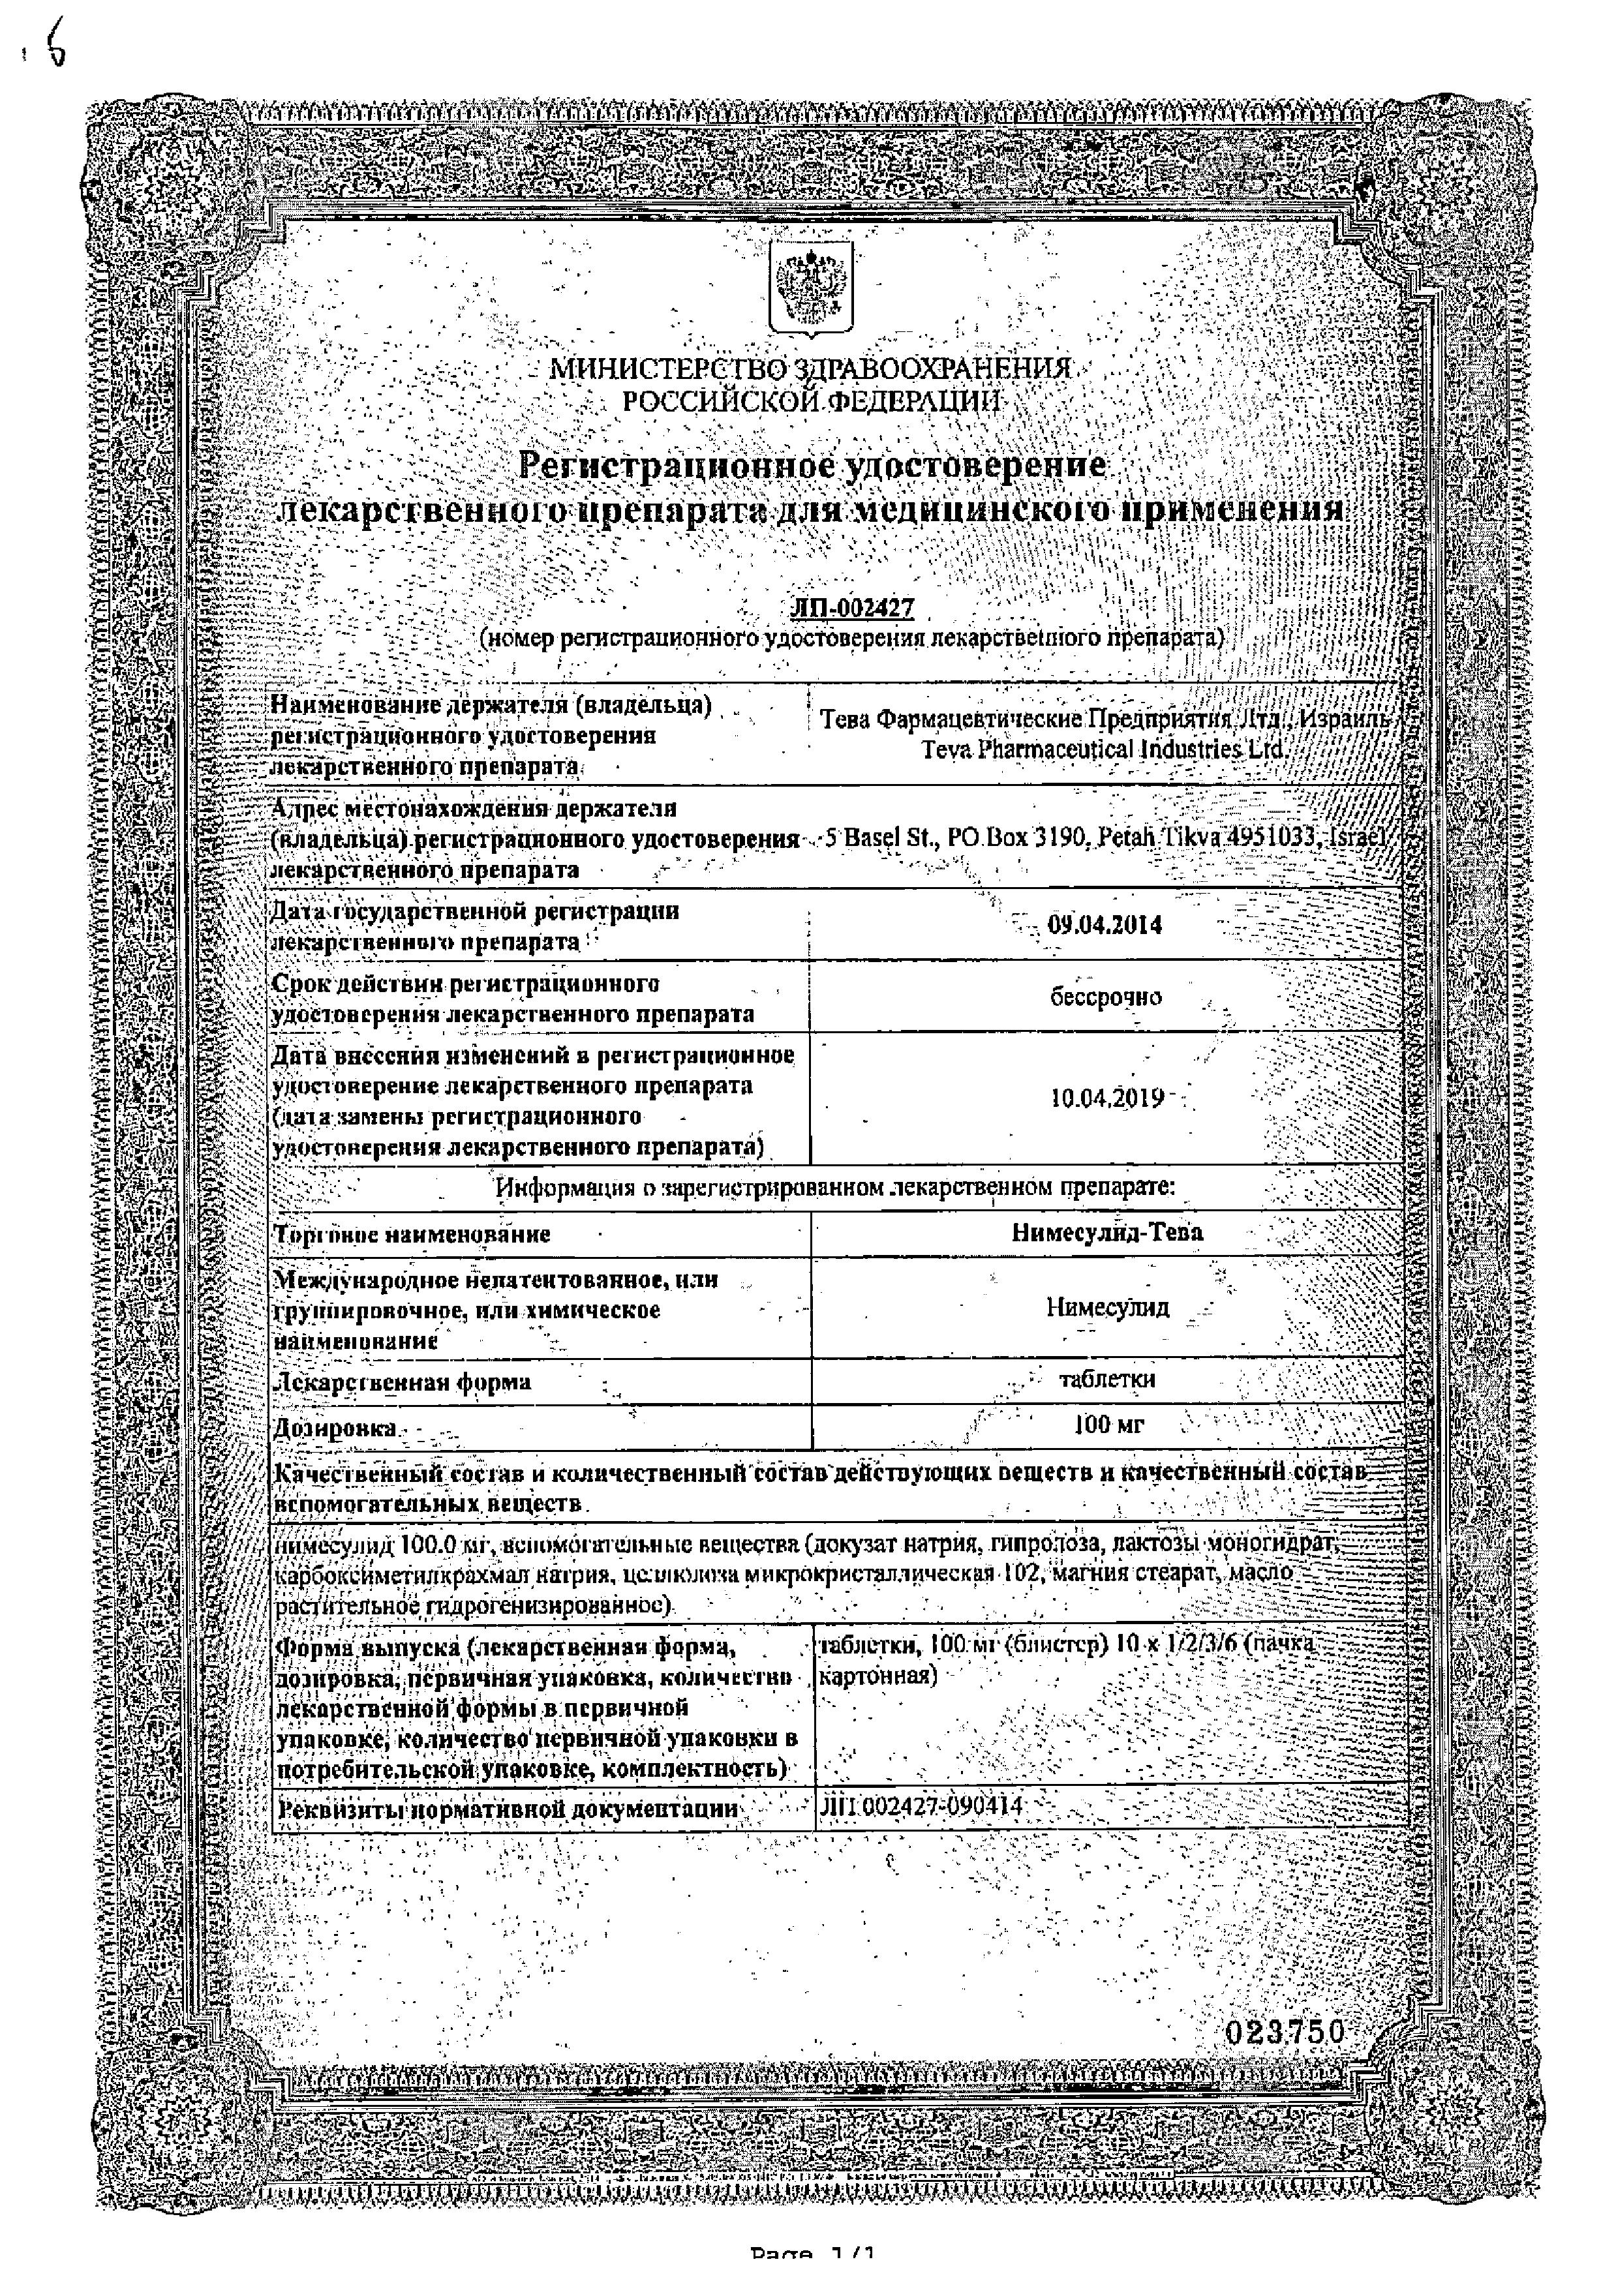 Нимесулид-Тева сертификат